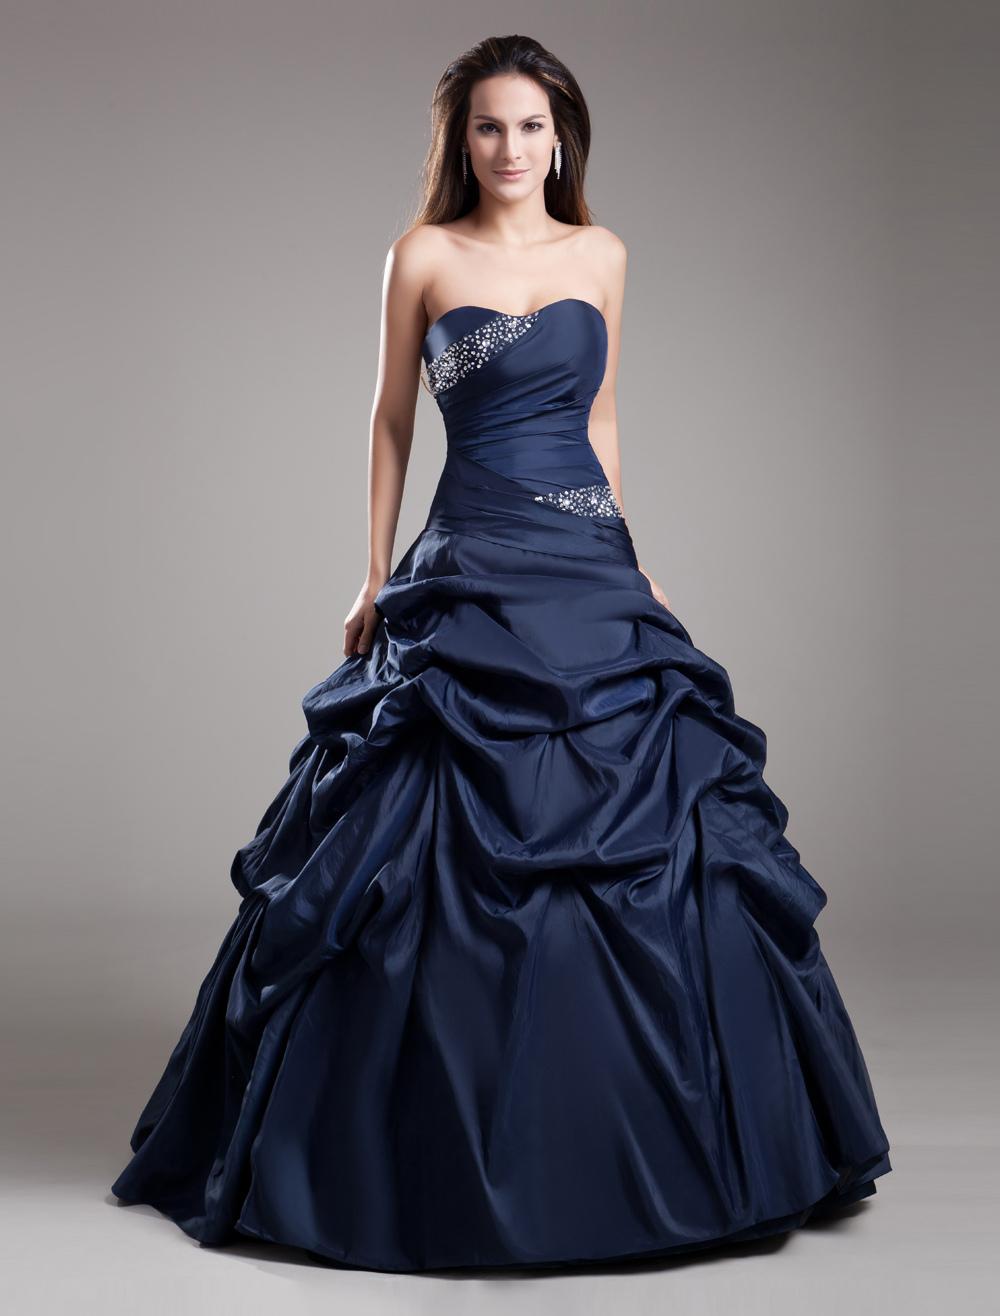 Elegant Formal Dark Navy Tiered Beading Taffeta Sweetheart Neck Women's Ball Gown